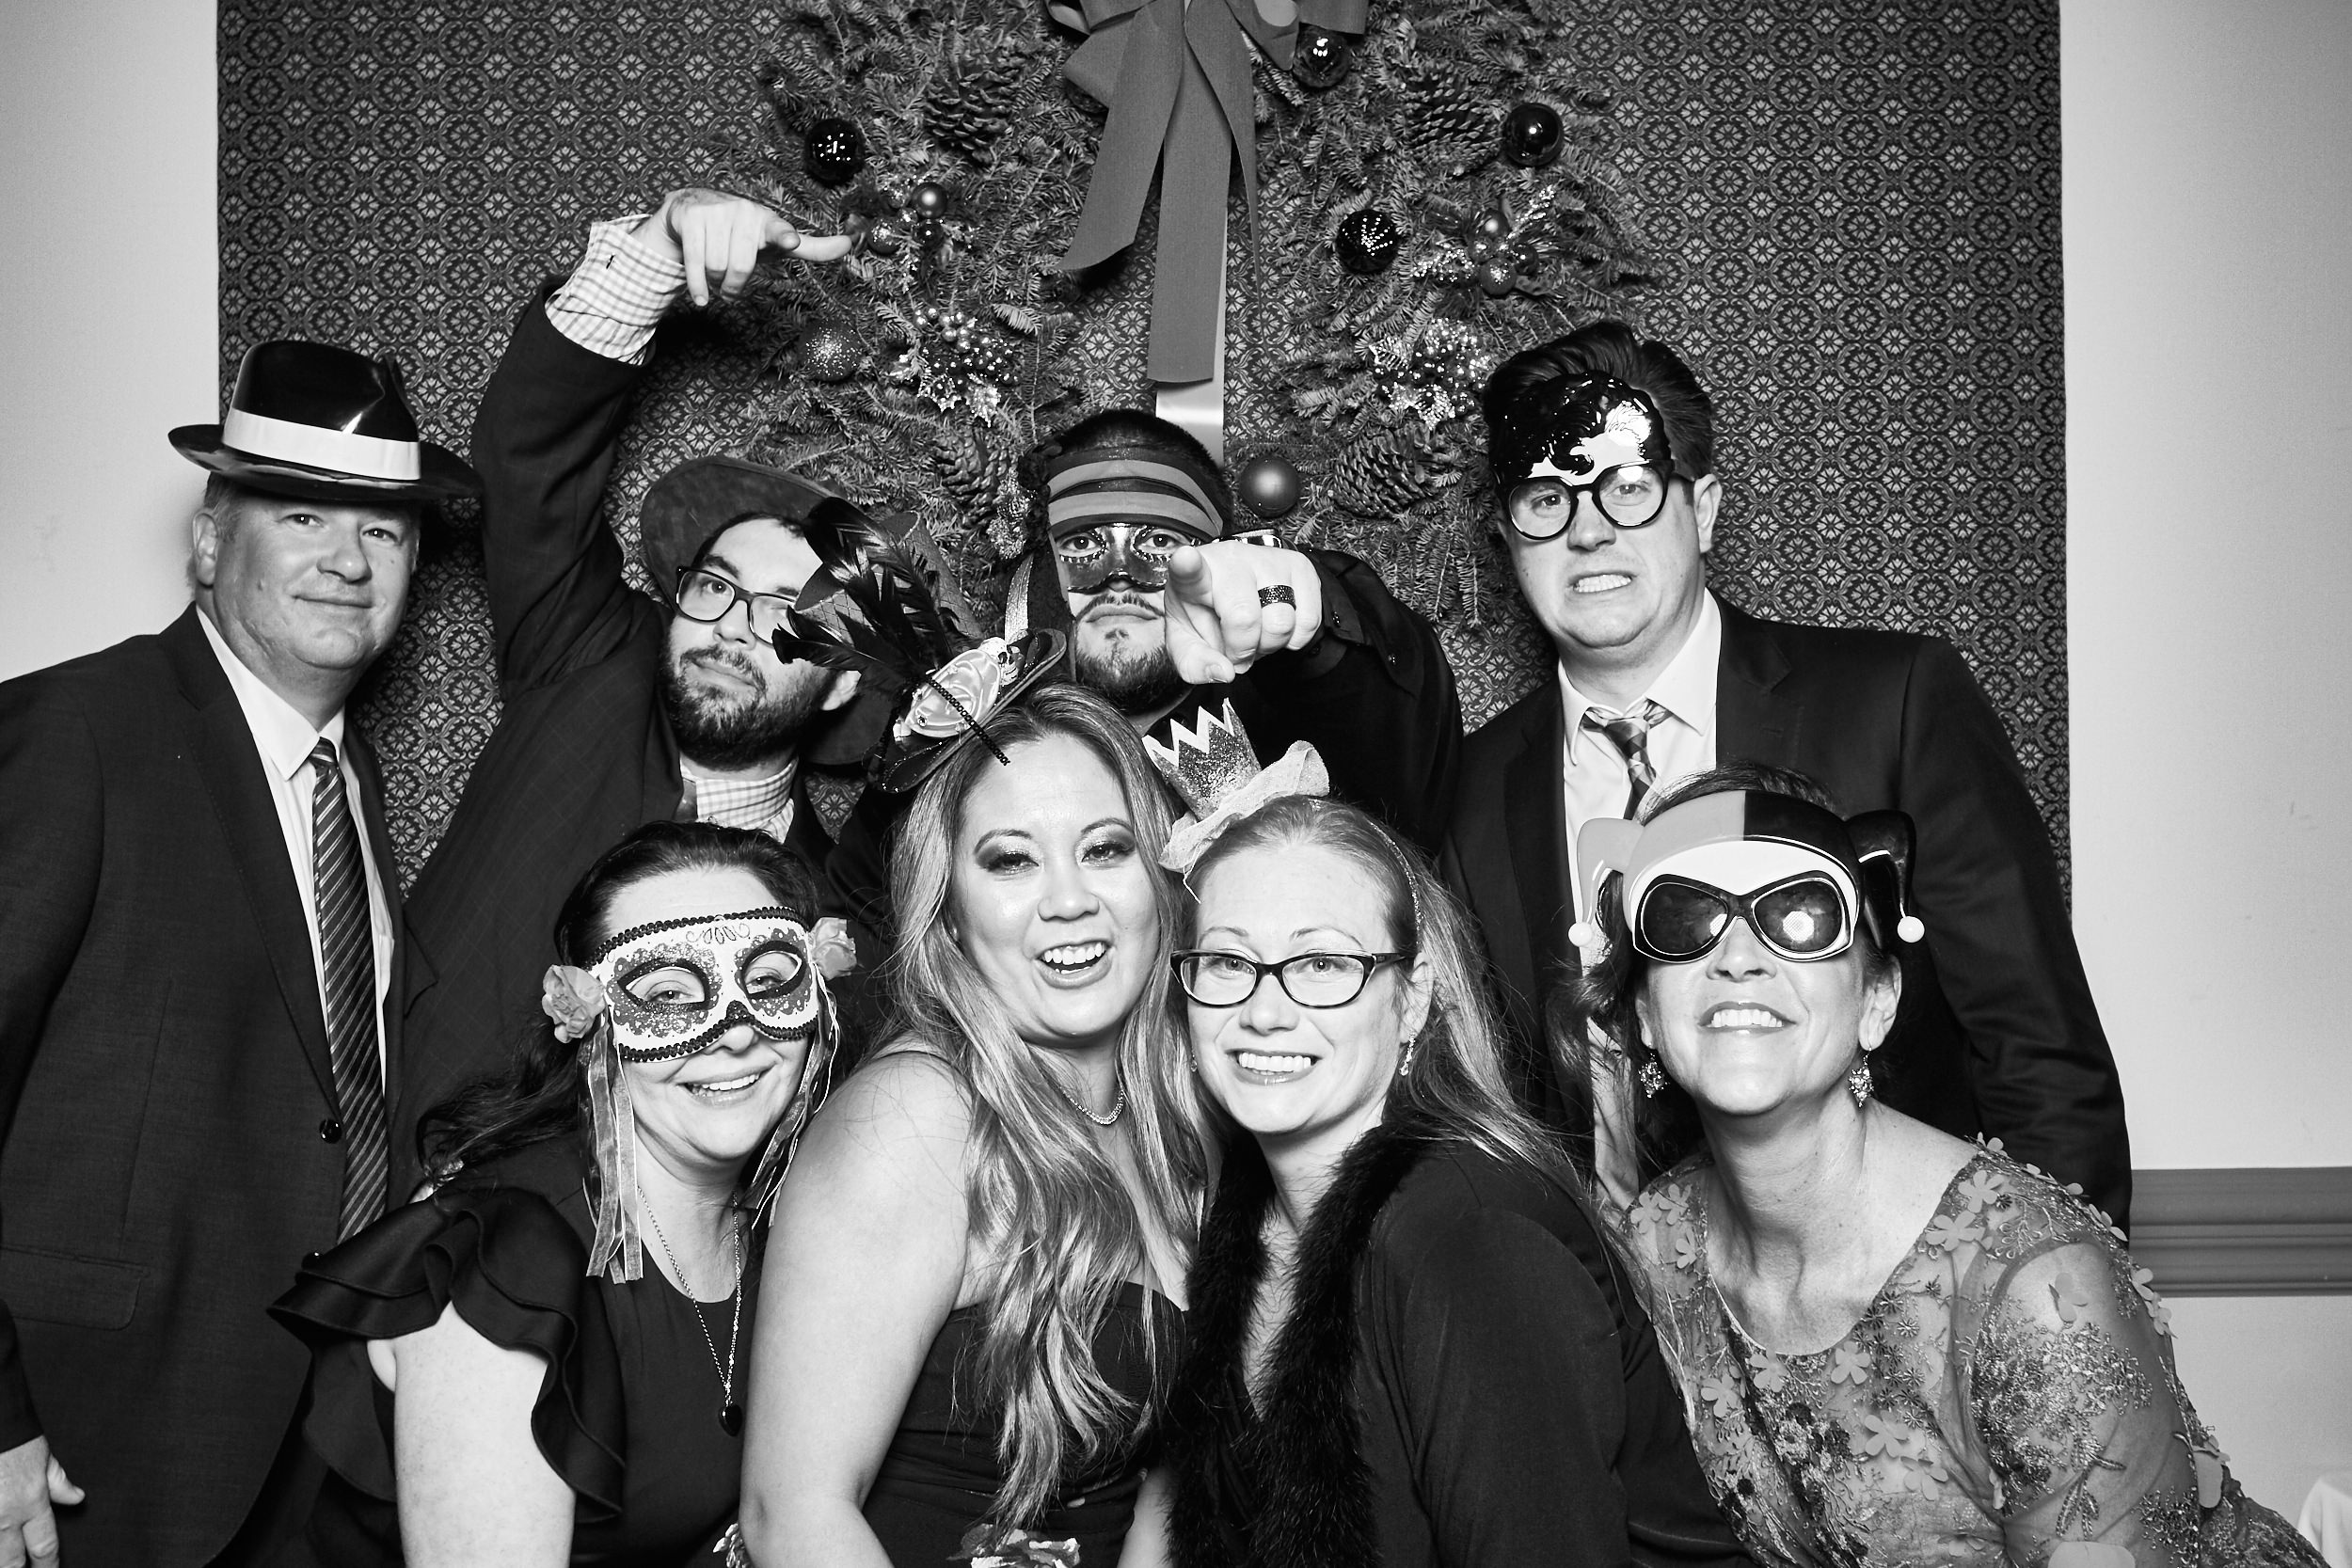 Alexa-James-Wedding-Photo-Booth999.jpg